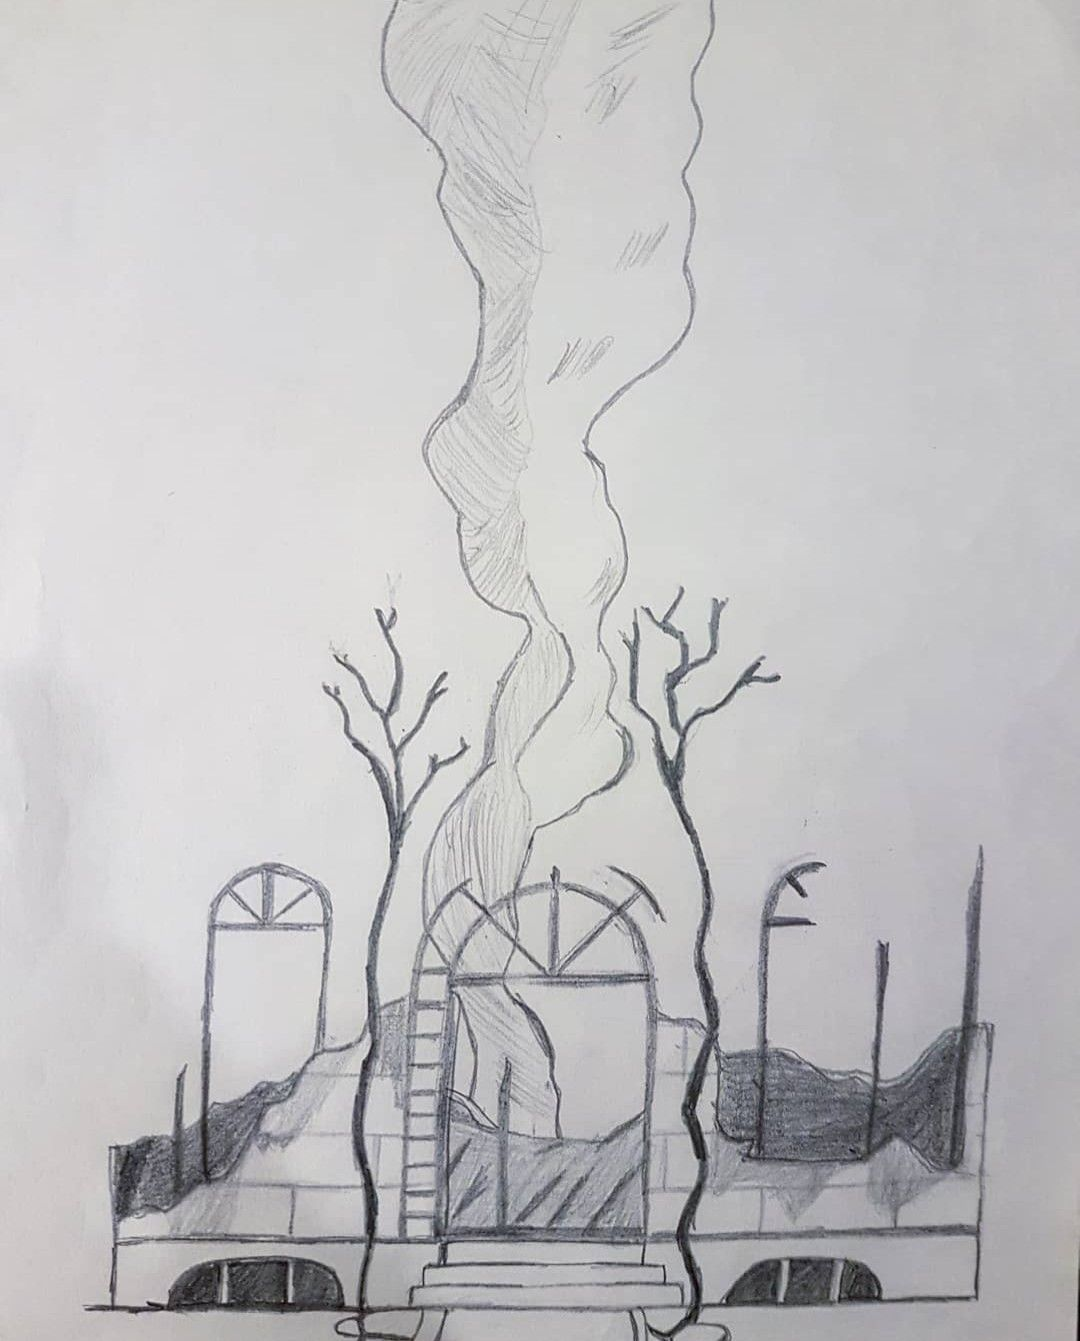 Baudelaire Mansion Burned Aseriesofunfortunateevents Lemonysnicket